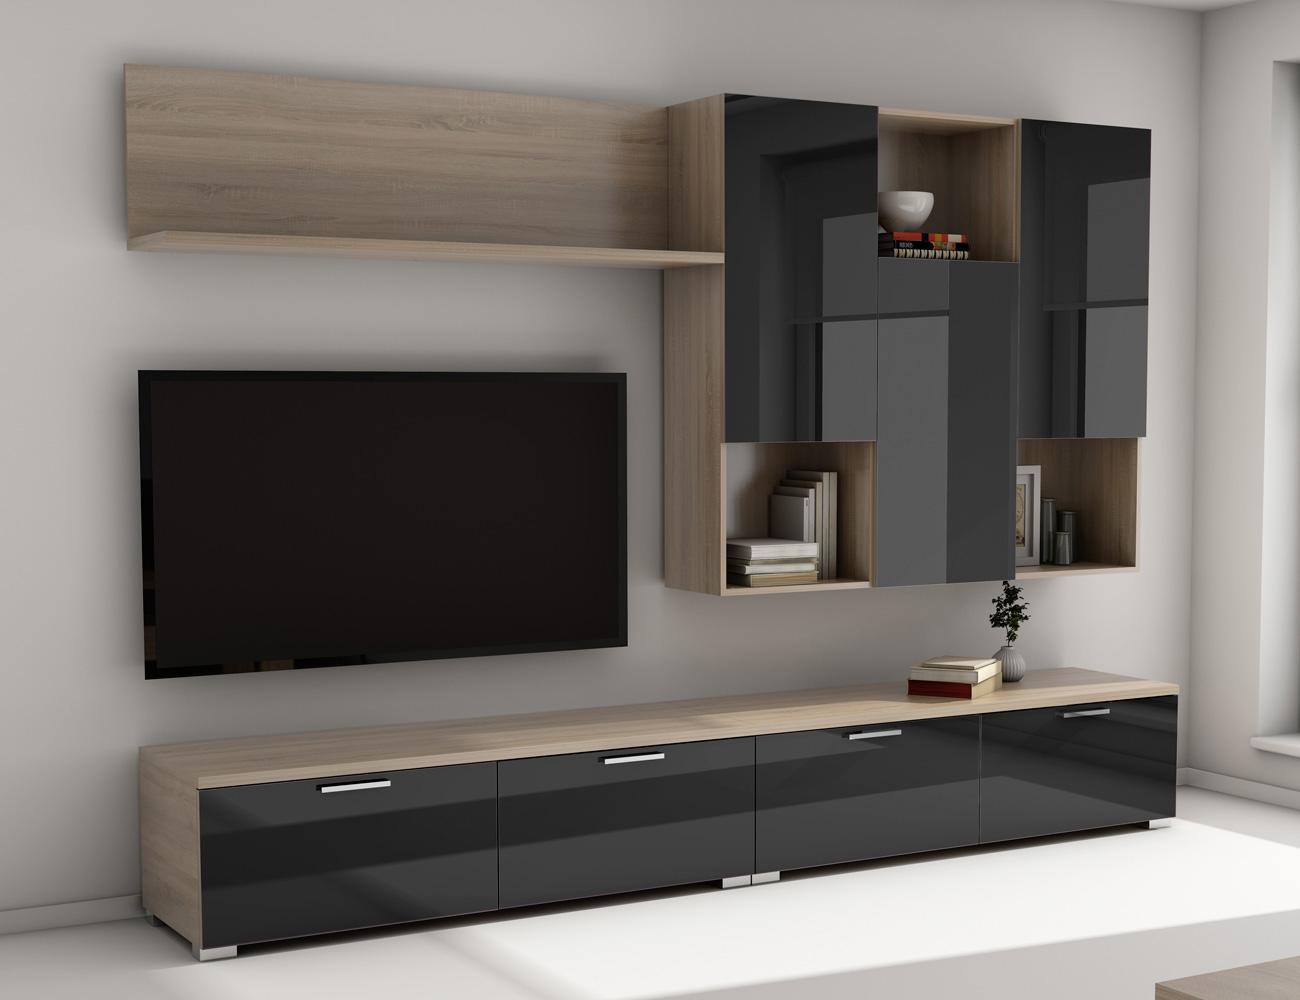 Mueble salon comedor 021 negro1